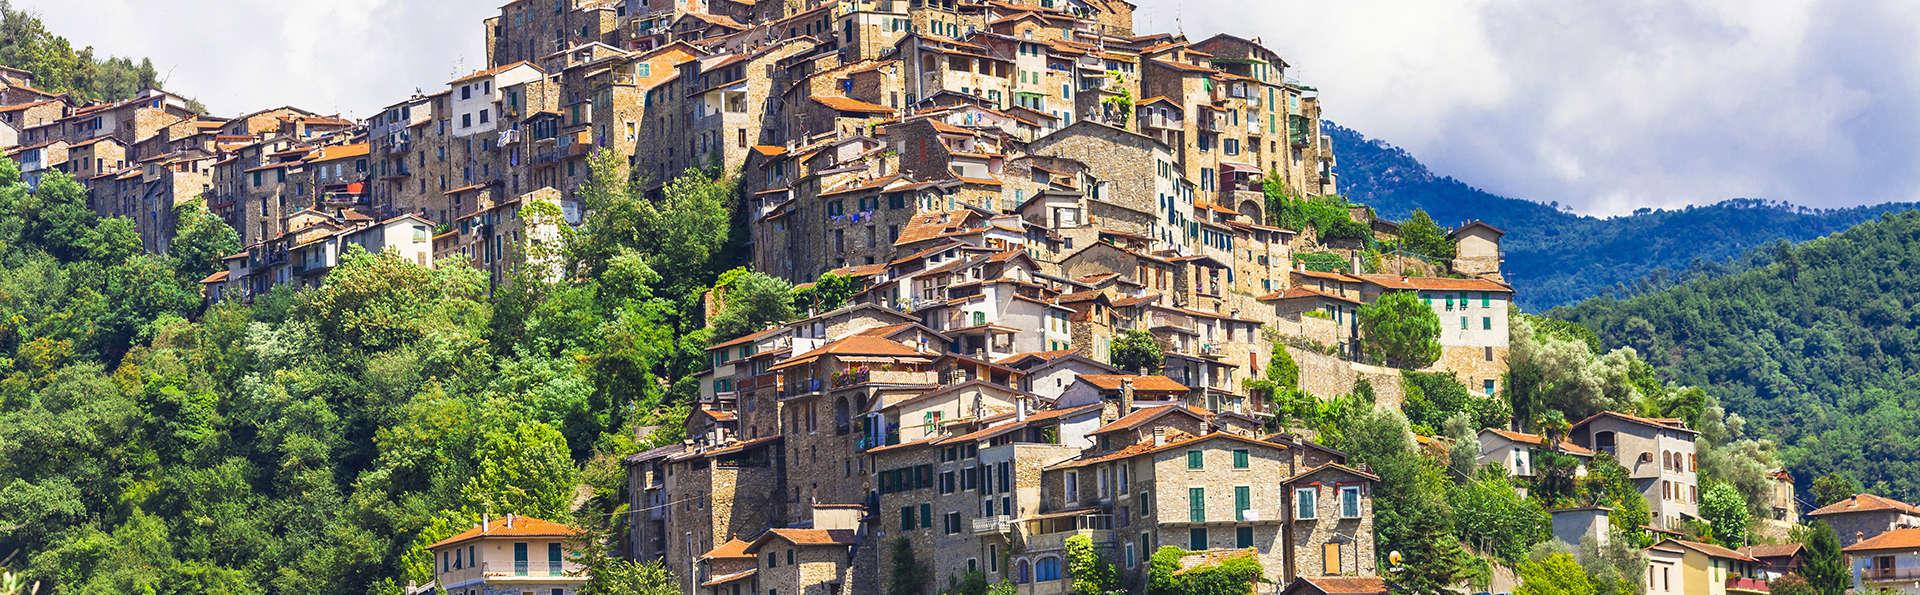 MuntaeCara Albergo Diffuso - EDIT-Fotolia_92763068_Apricale.jpg